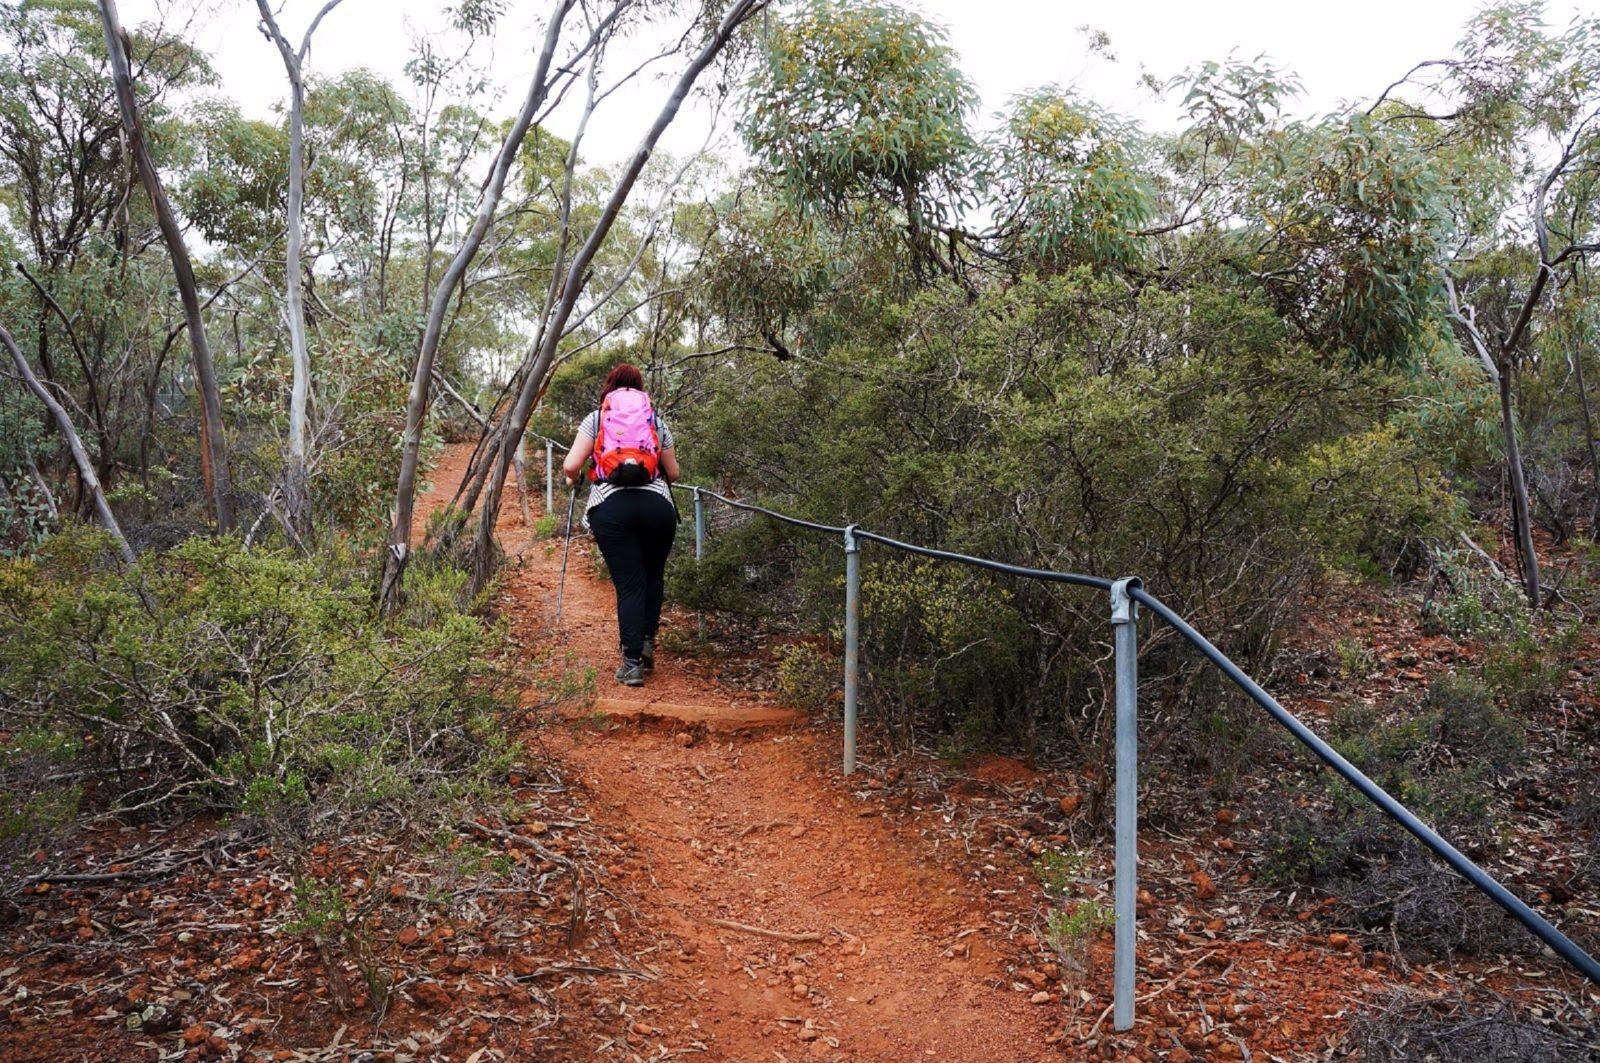 Mount Matilda Walk Trail, Wongan Hills, Western Australia